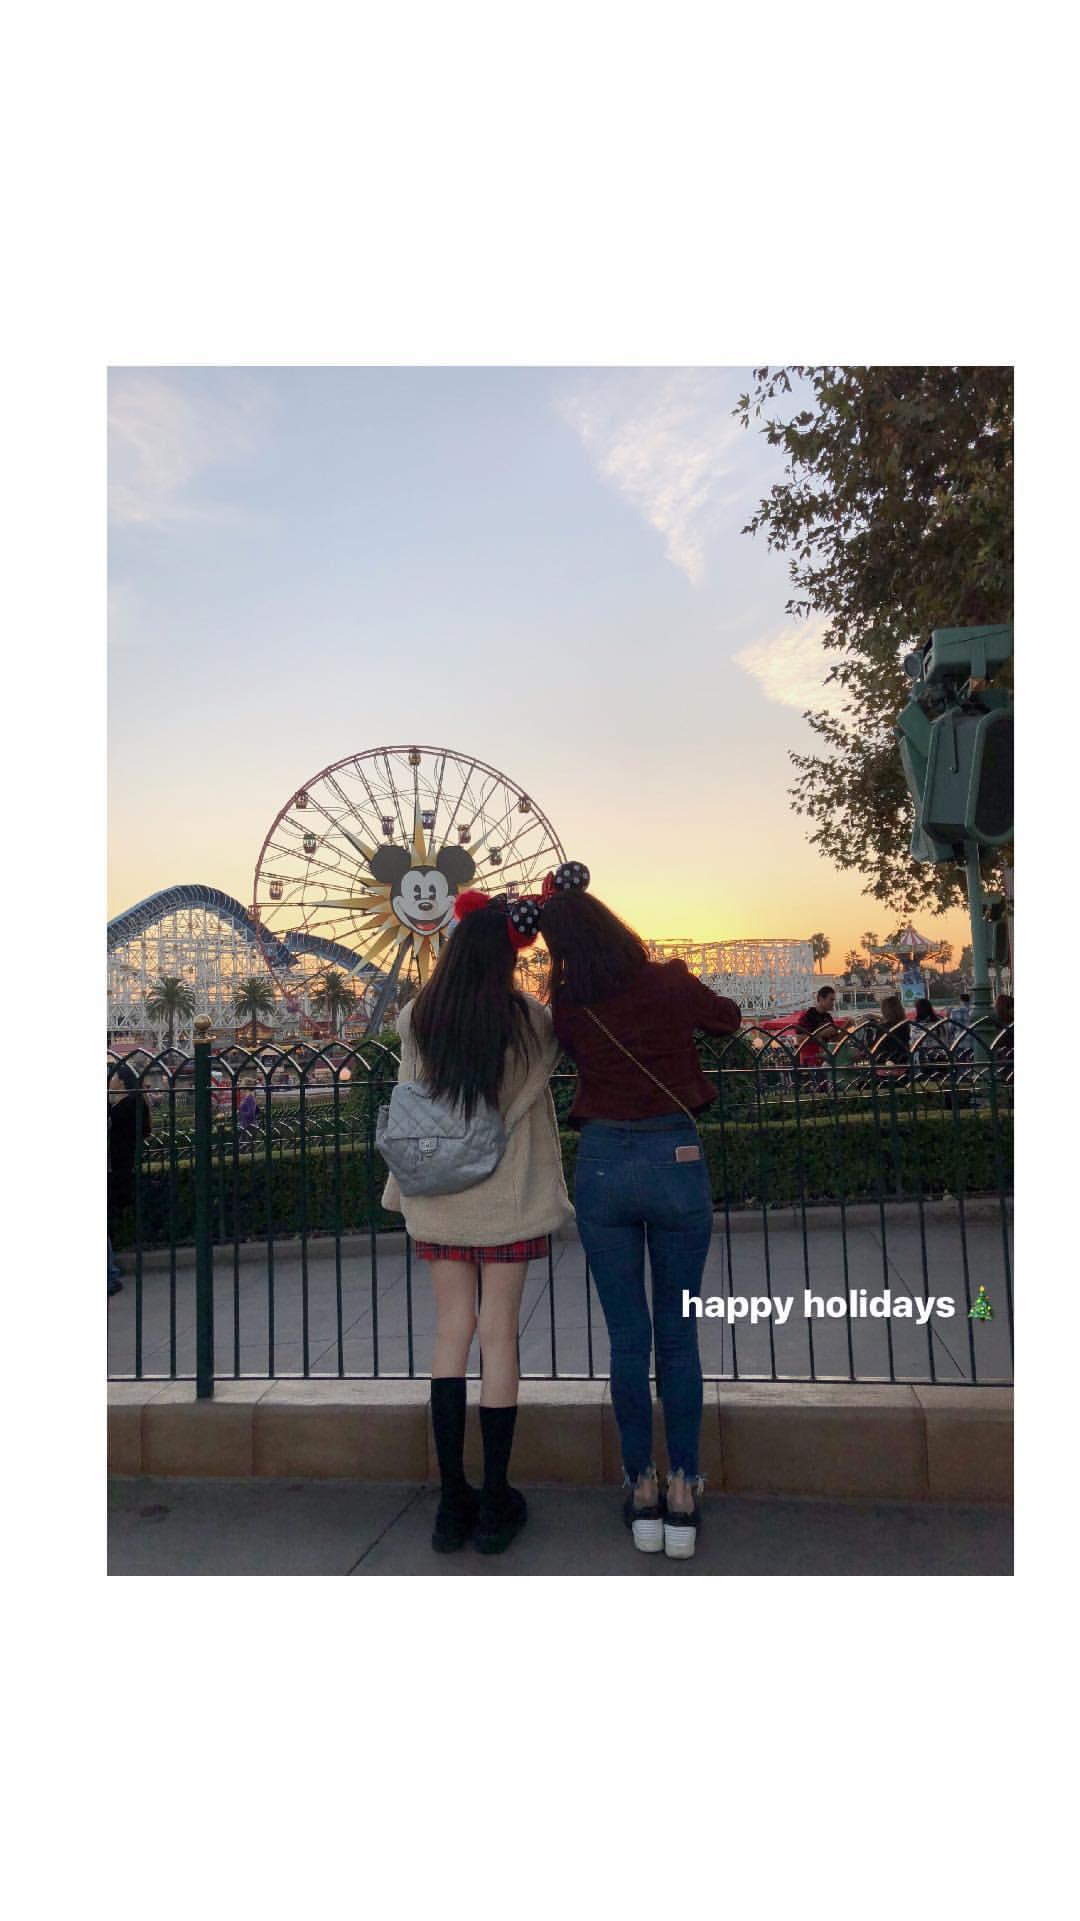 [INSTAGRAM STORY] xolovestephi: happy holidays �� https://t.co/VWi5KvhUzK https://t.co/Ad1uaHPCPx